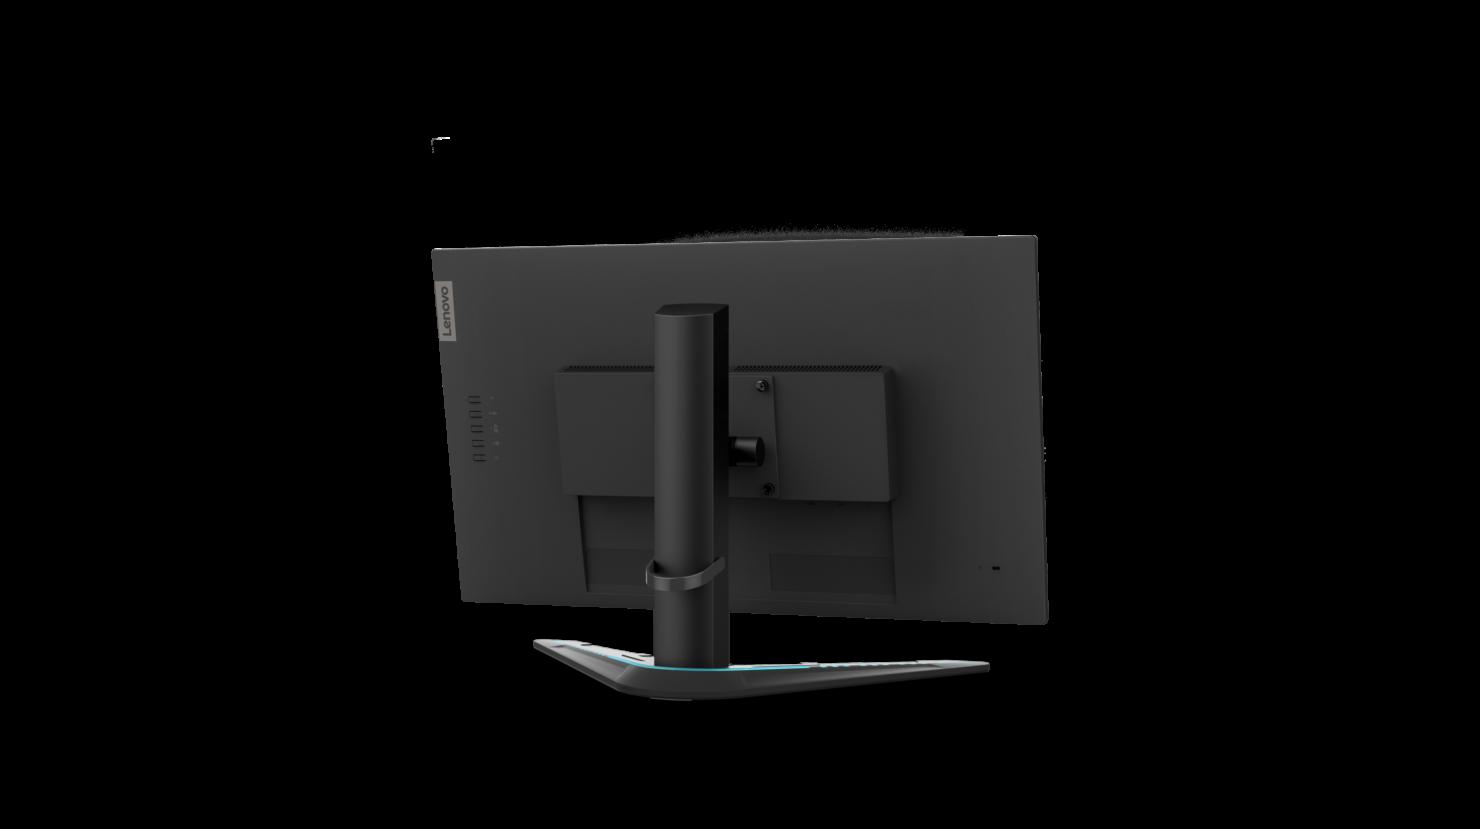 lenovo-g27q-20-gaming-monitor_facing_right_lowest_height-custom